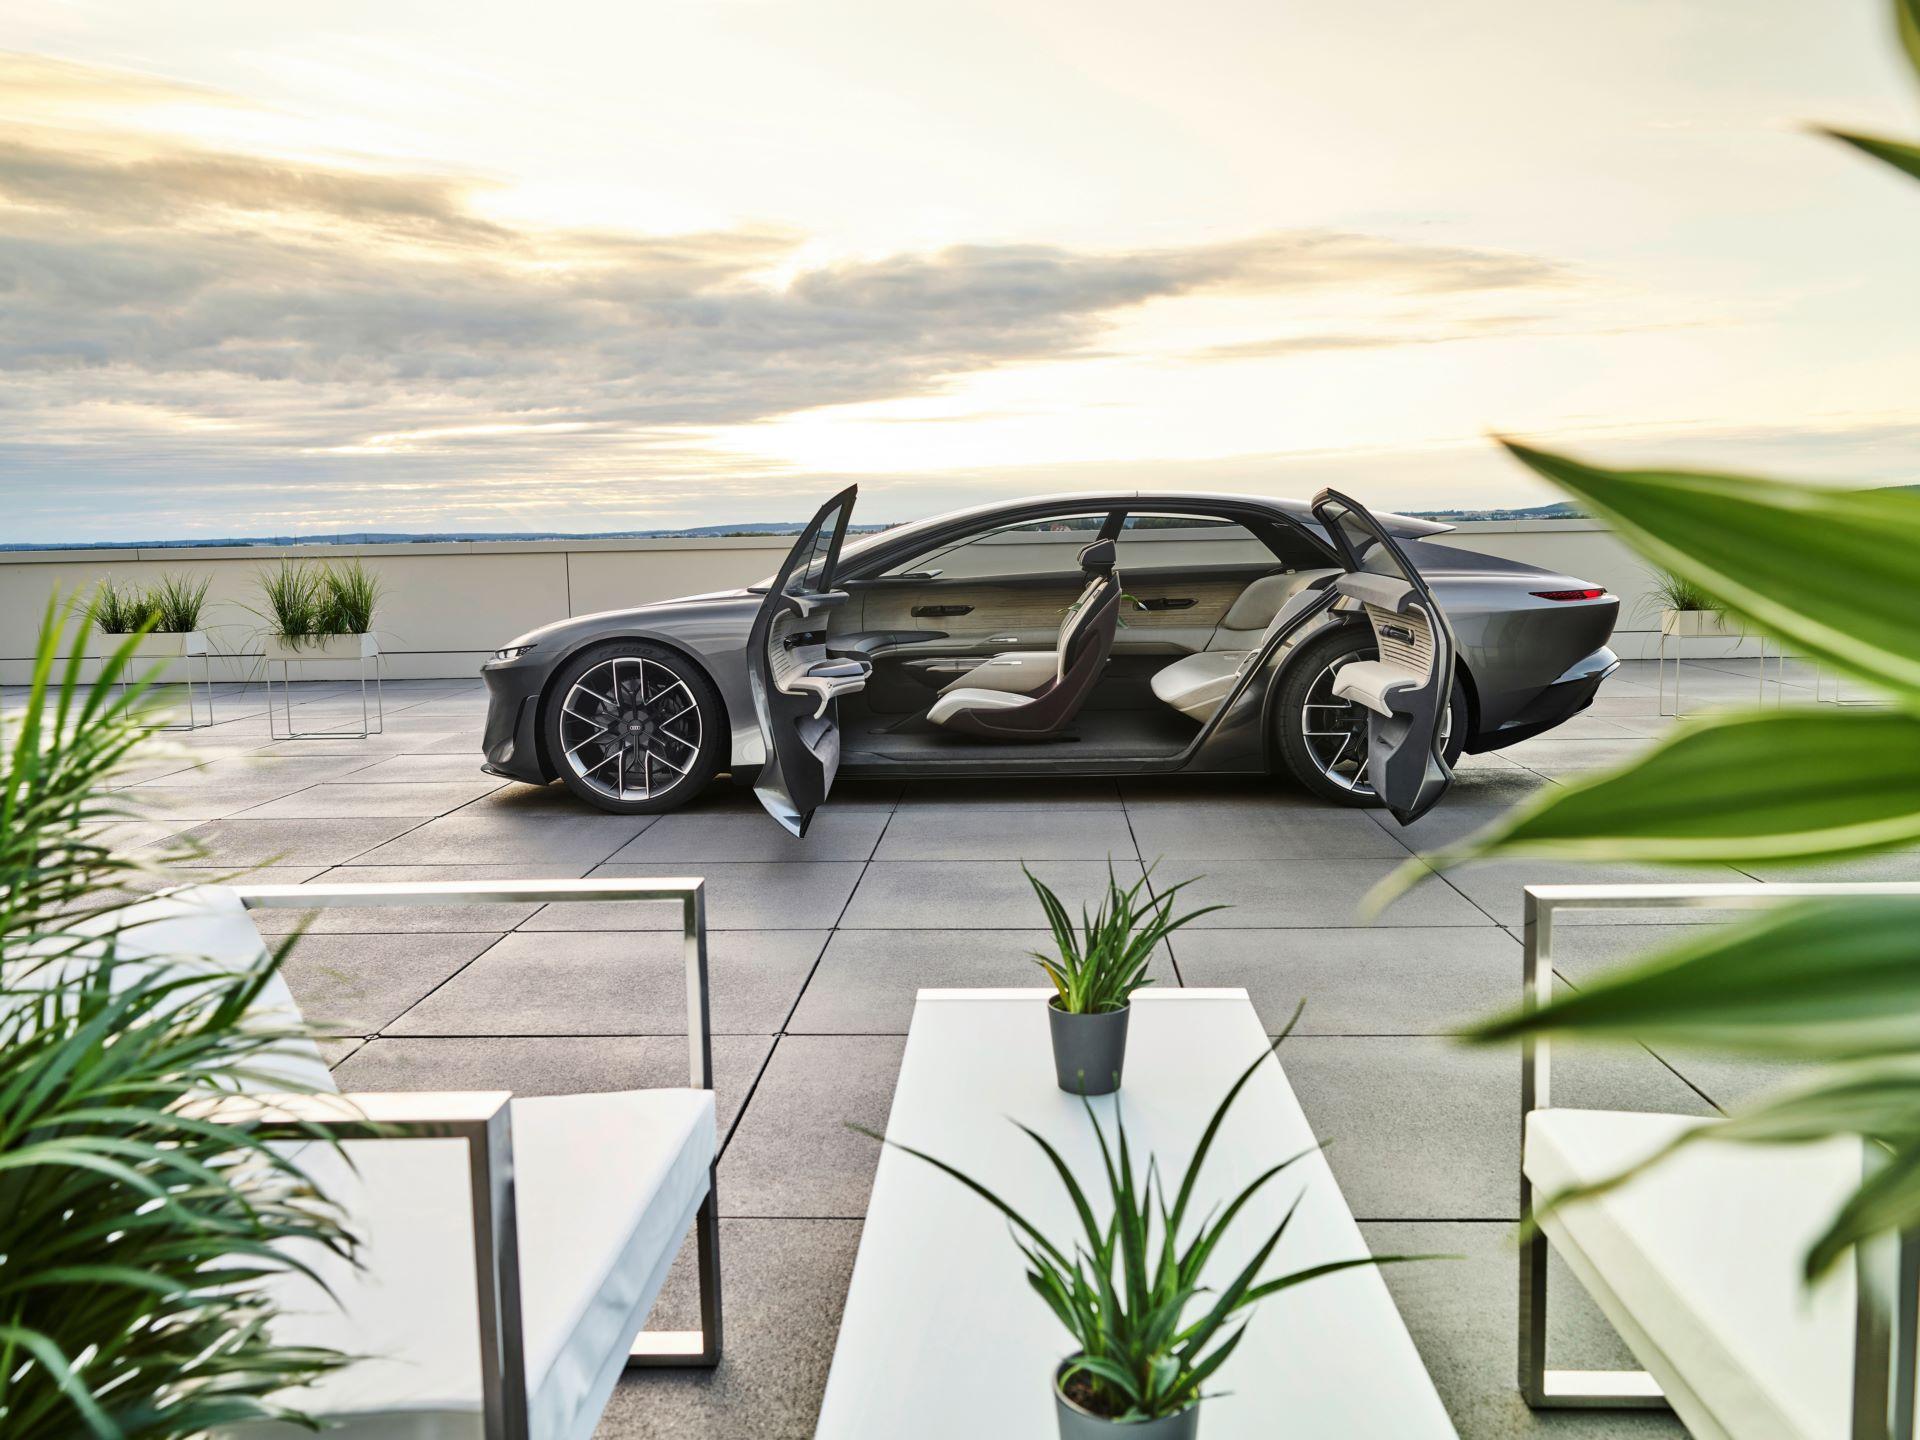 Audi-GrandSphere-concept-6